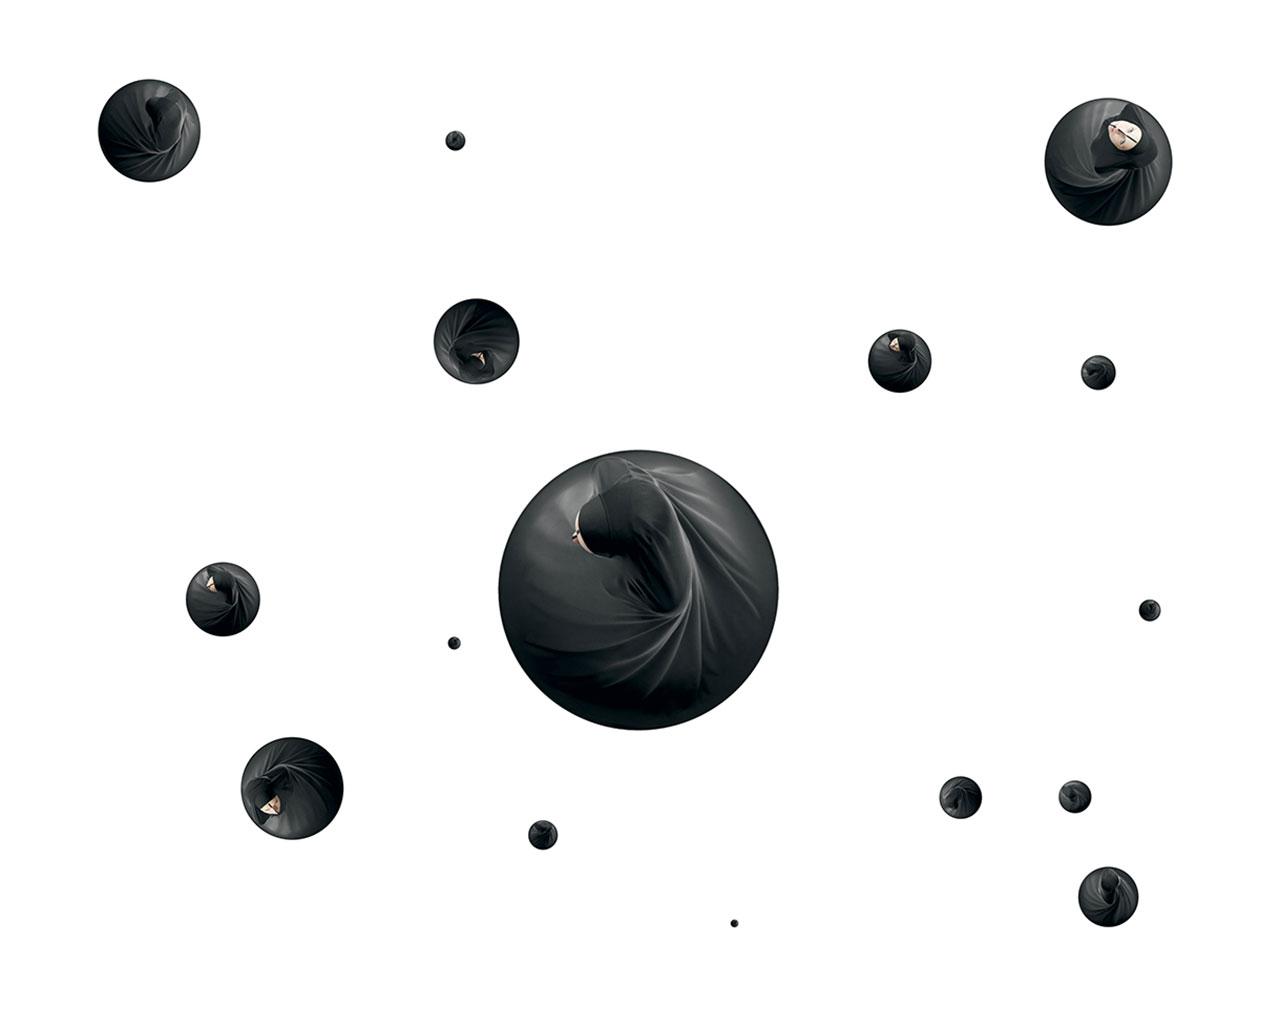 Maïmouna Guerresi,Cosmo, 2009, Lambaprintonplexiglas,ø80,50,40,30,28,22,18,7,5 cm. Copyright© Maïmouna Guerresi,courtesyMariane Ibrahim Gallery-Seattle&Matèria Gallery-Rome.